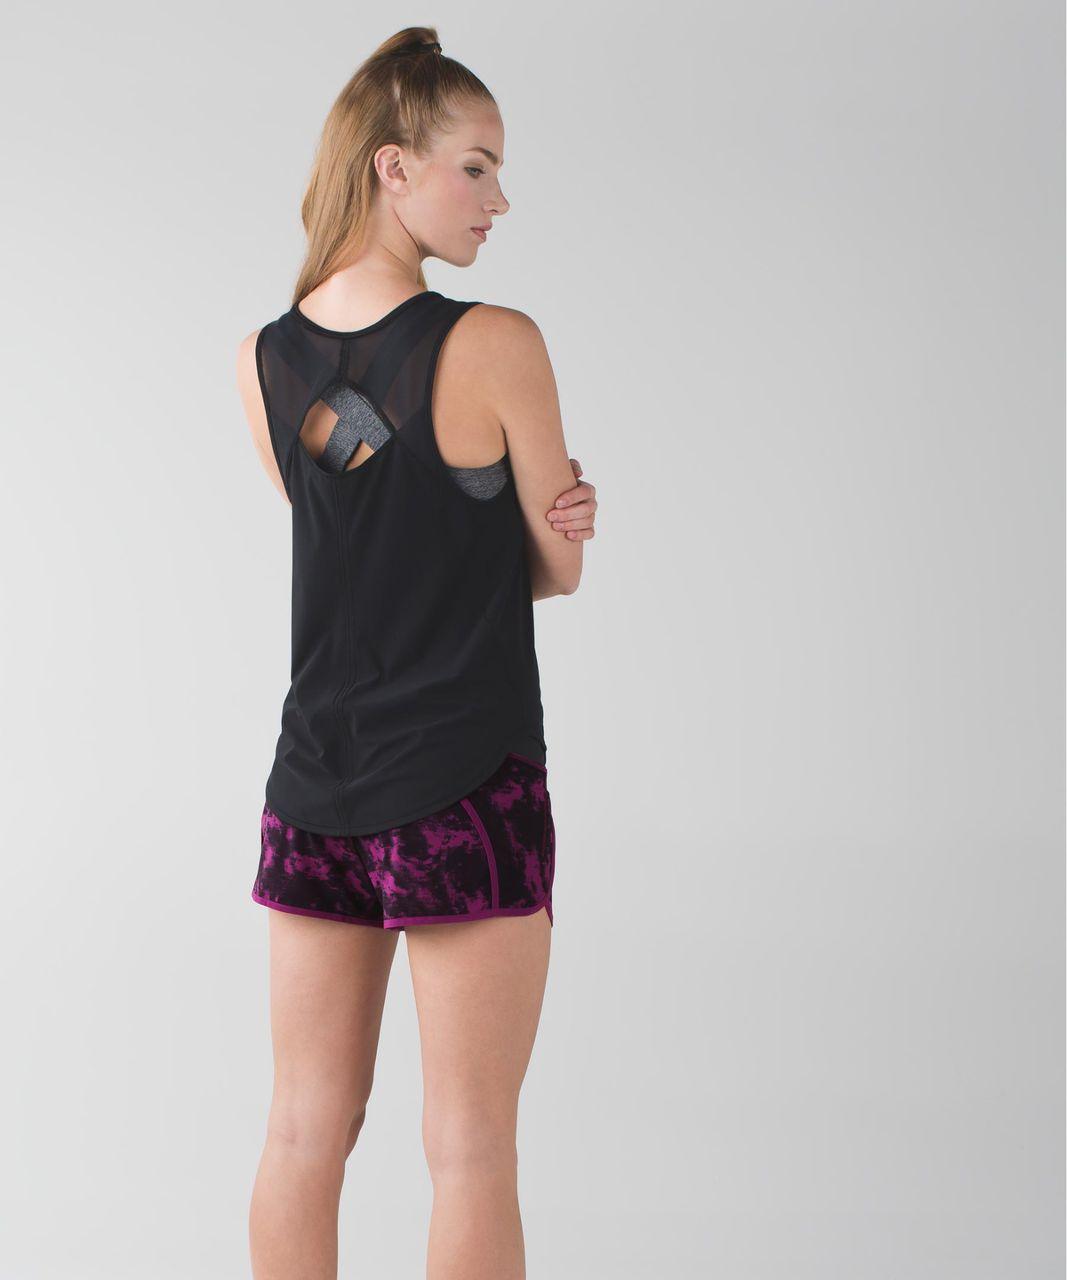 Lululemon Run Times Short *4-way Stretch - Breezie Regal Plum Black / Black / Regal Plum